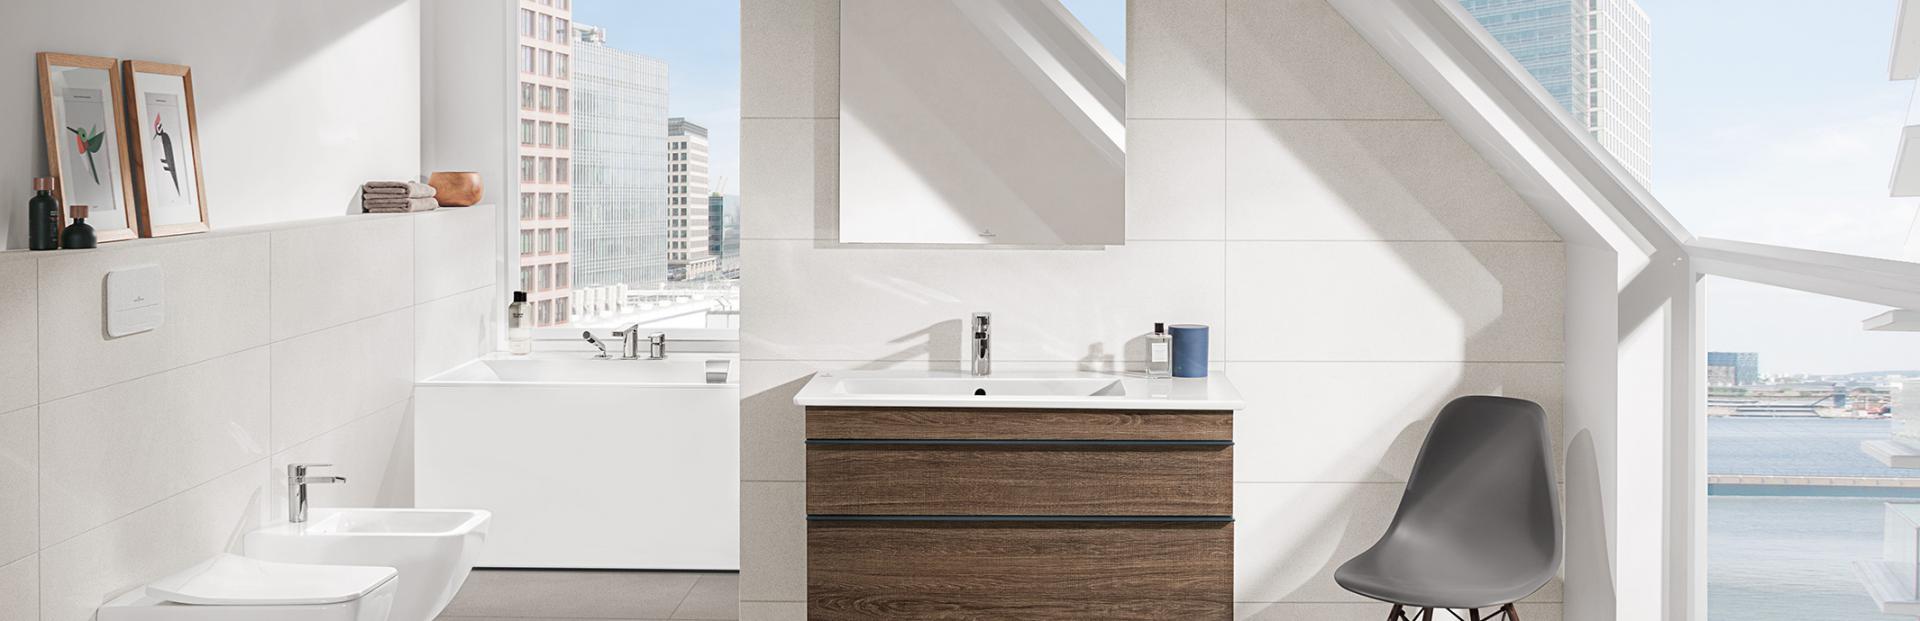 sechseckwanne dachschr ge. Black Bedroom Furniture Sets. Home Design Ideas